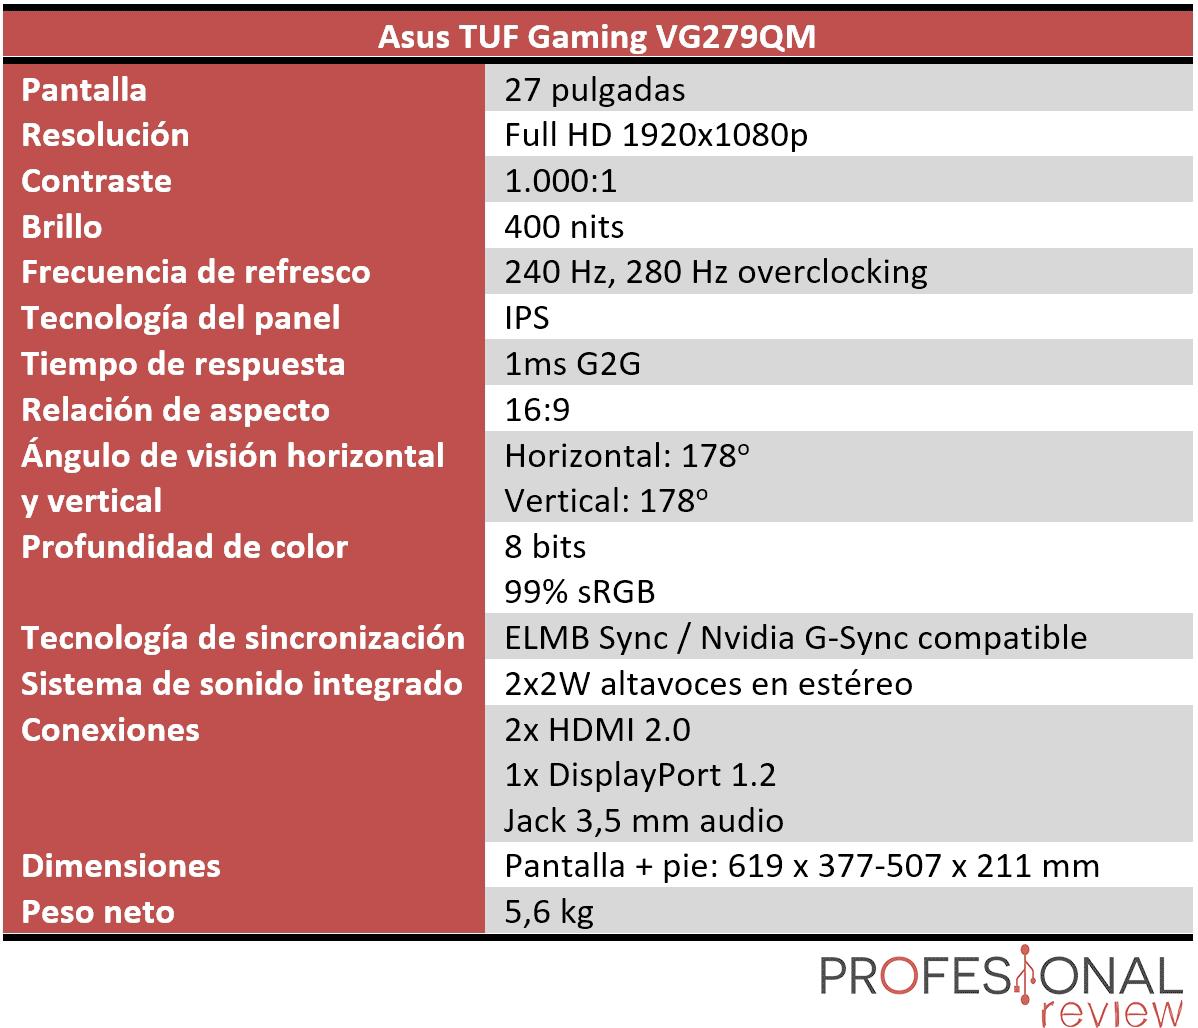 Asus TUF Gaming VG279QM características